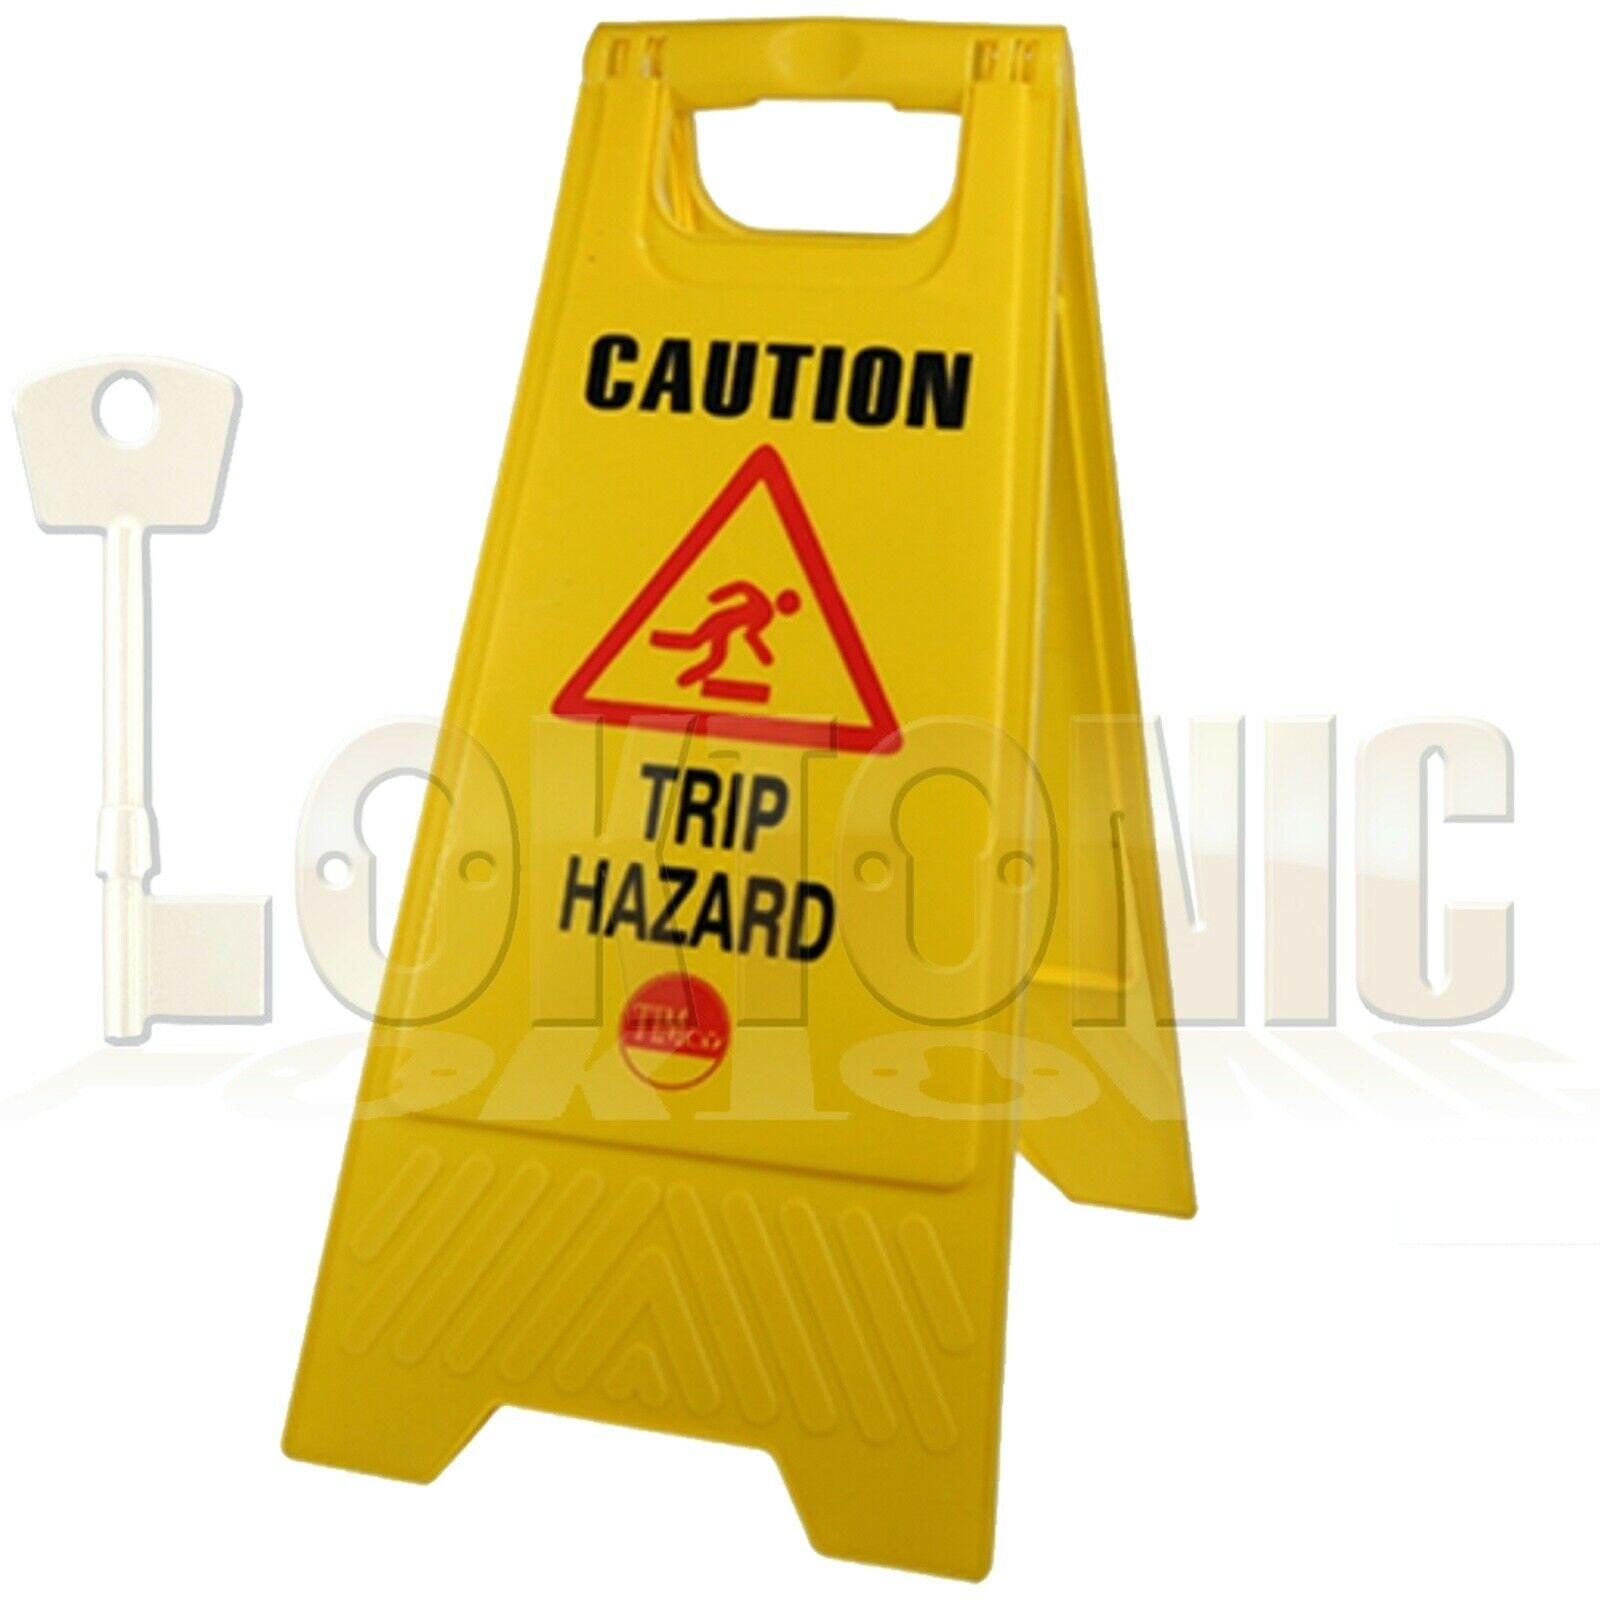 Professional Caution A-Frame Safety Warning Sign Trip Hazard 610 x 300 x 30